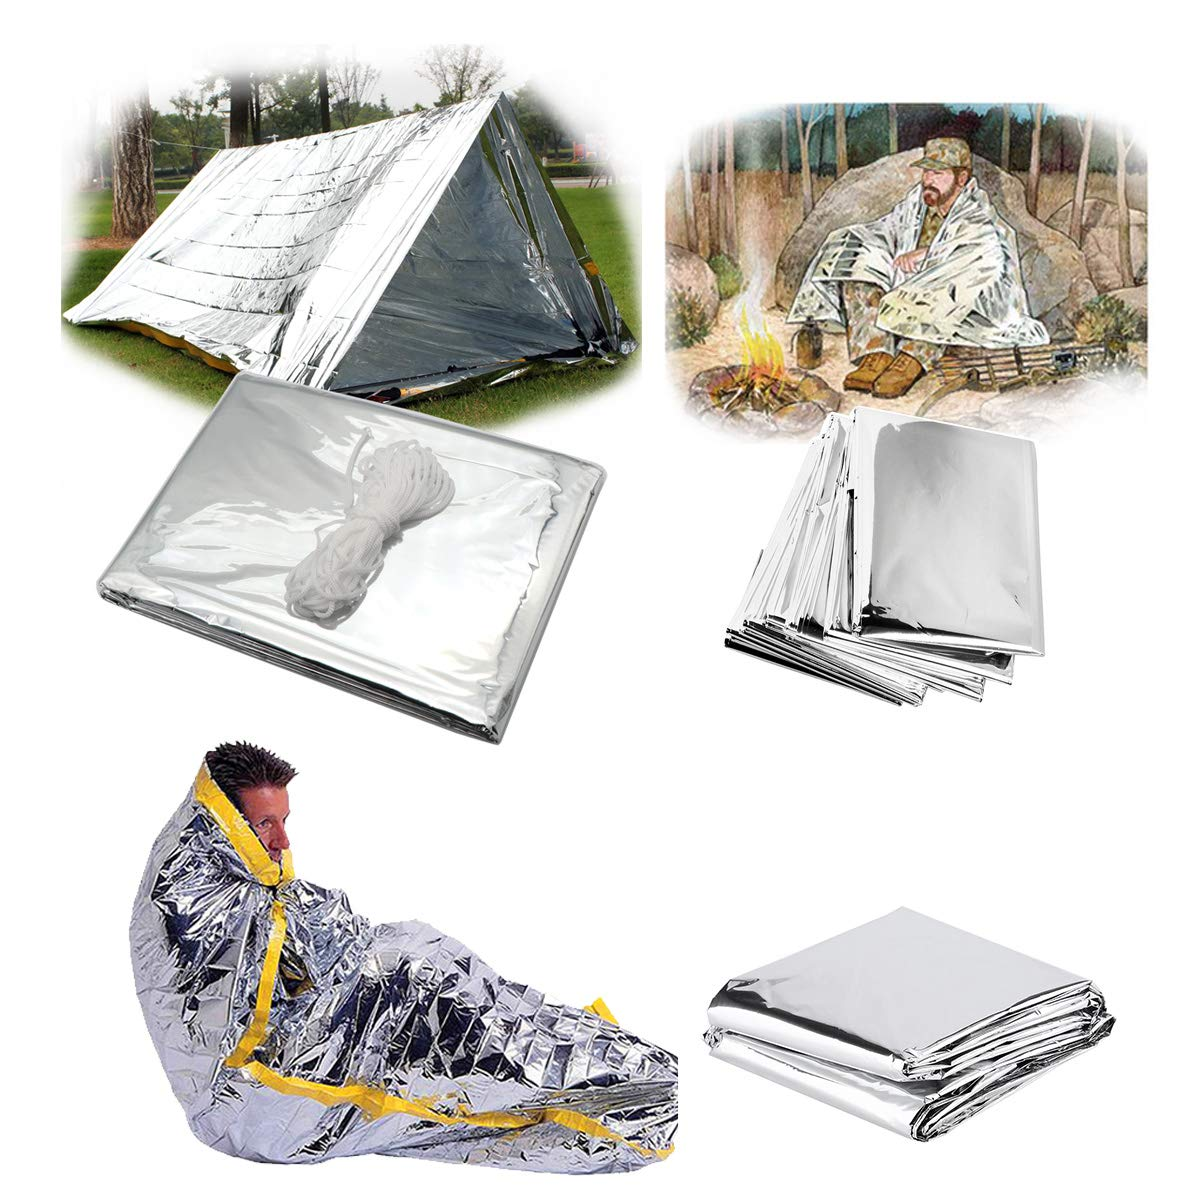 Dremengo 3 in 1 Emergency Tent Sleeping Bag Blanket Mylar Thermal Blankets Outdoor Hiking Survival